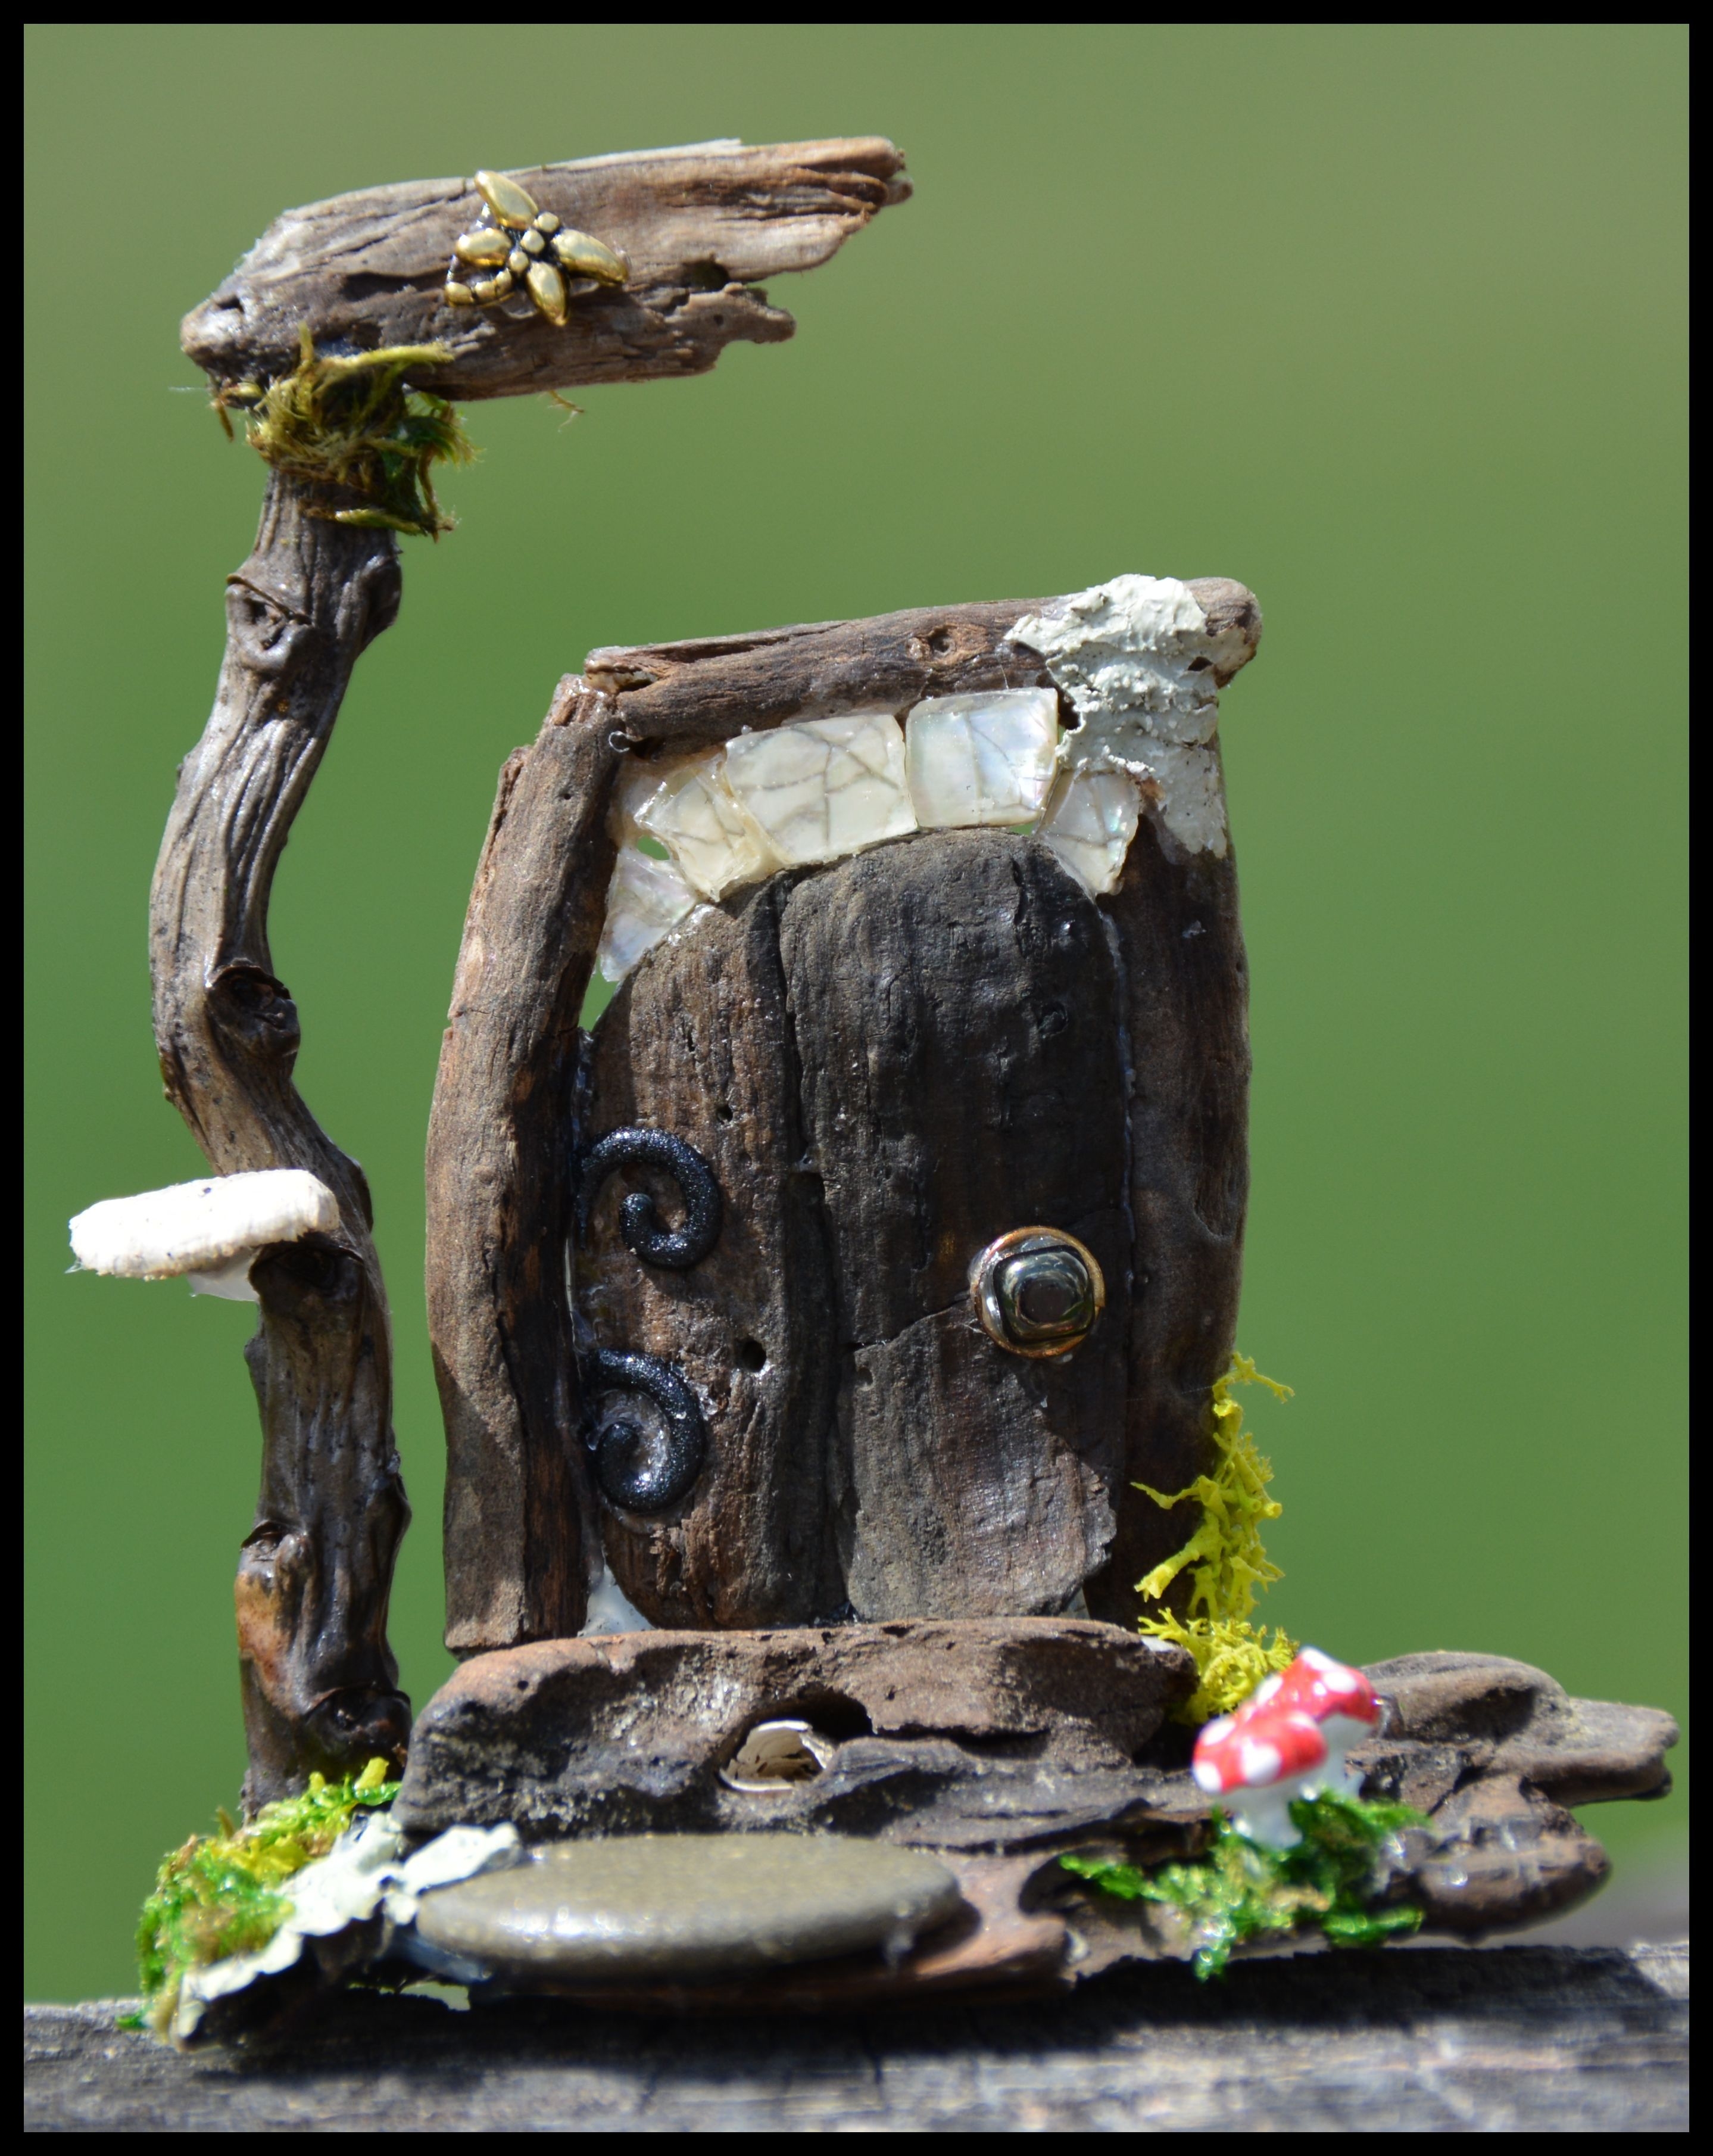 Miniature Faery Garden fairy door I created from driftwood, stones, and tree fungus.